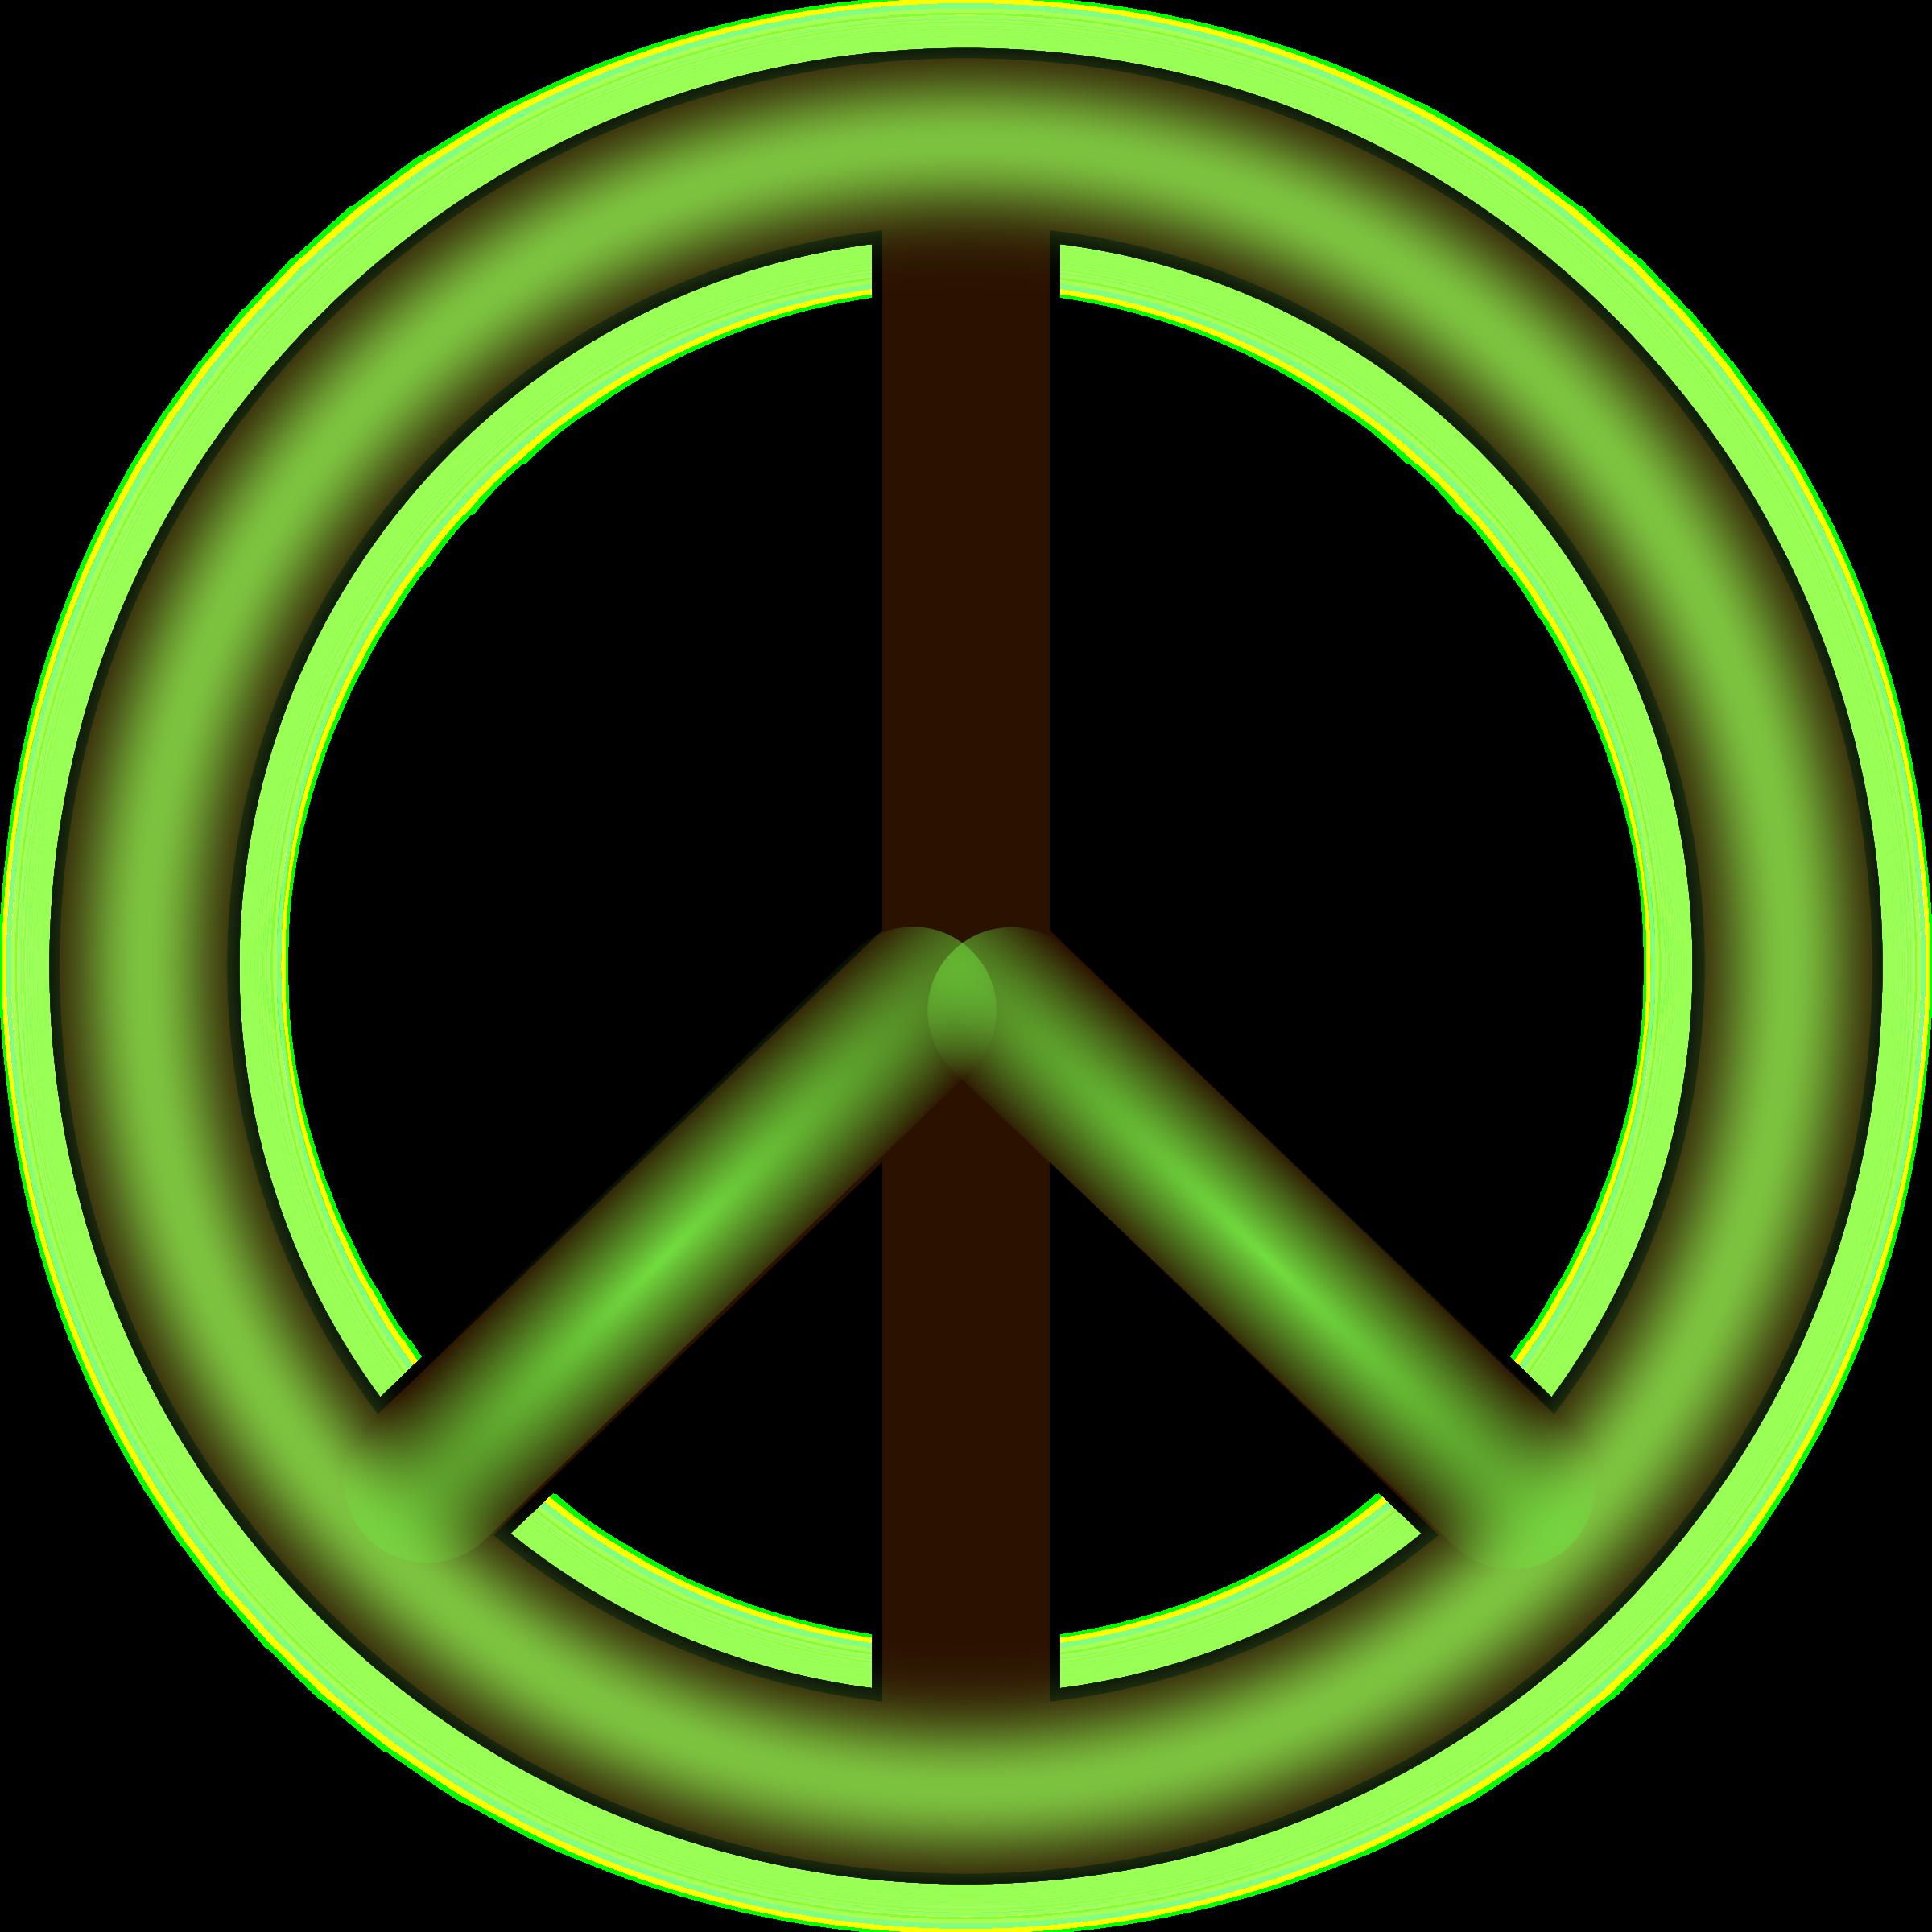 Symbol images free download. Peace clipart symbolism